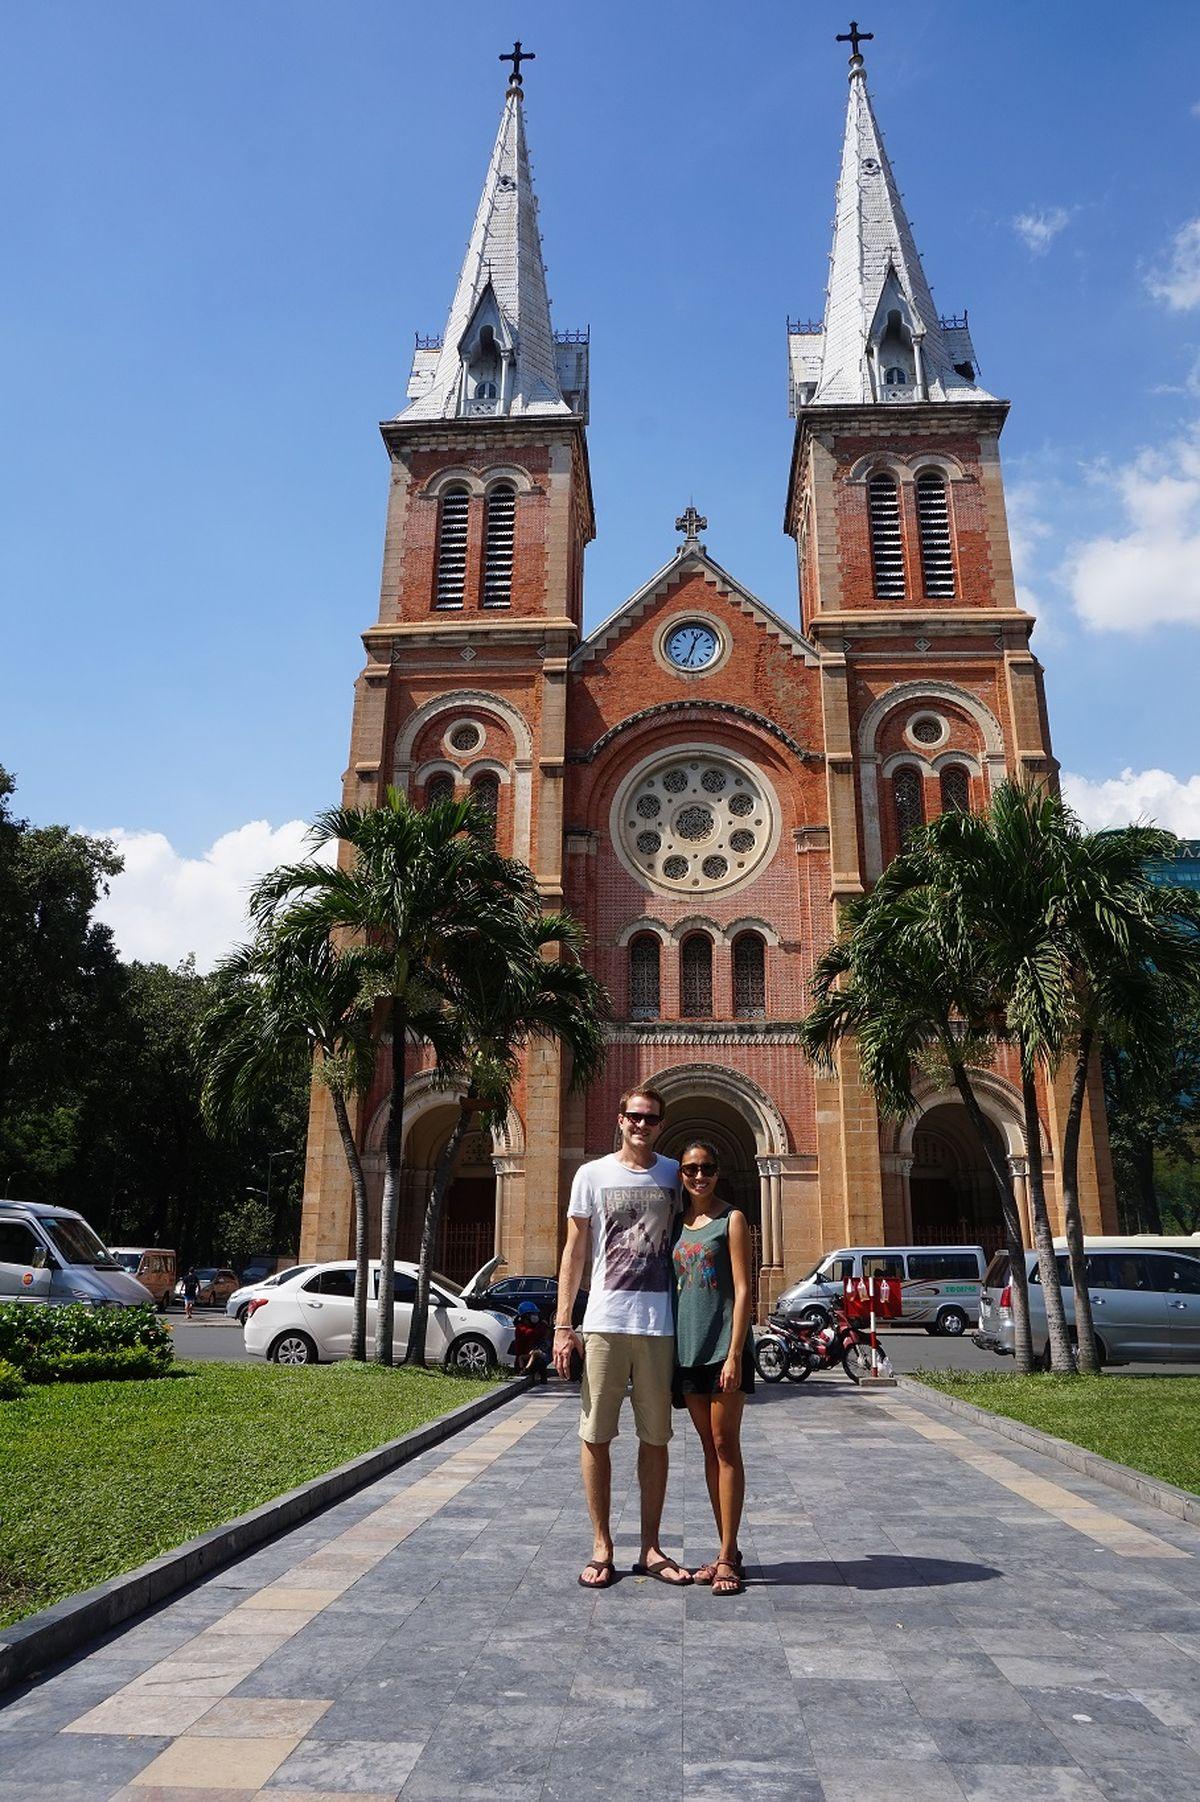 Notre Dame Ho Chi Minh